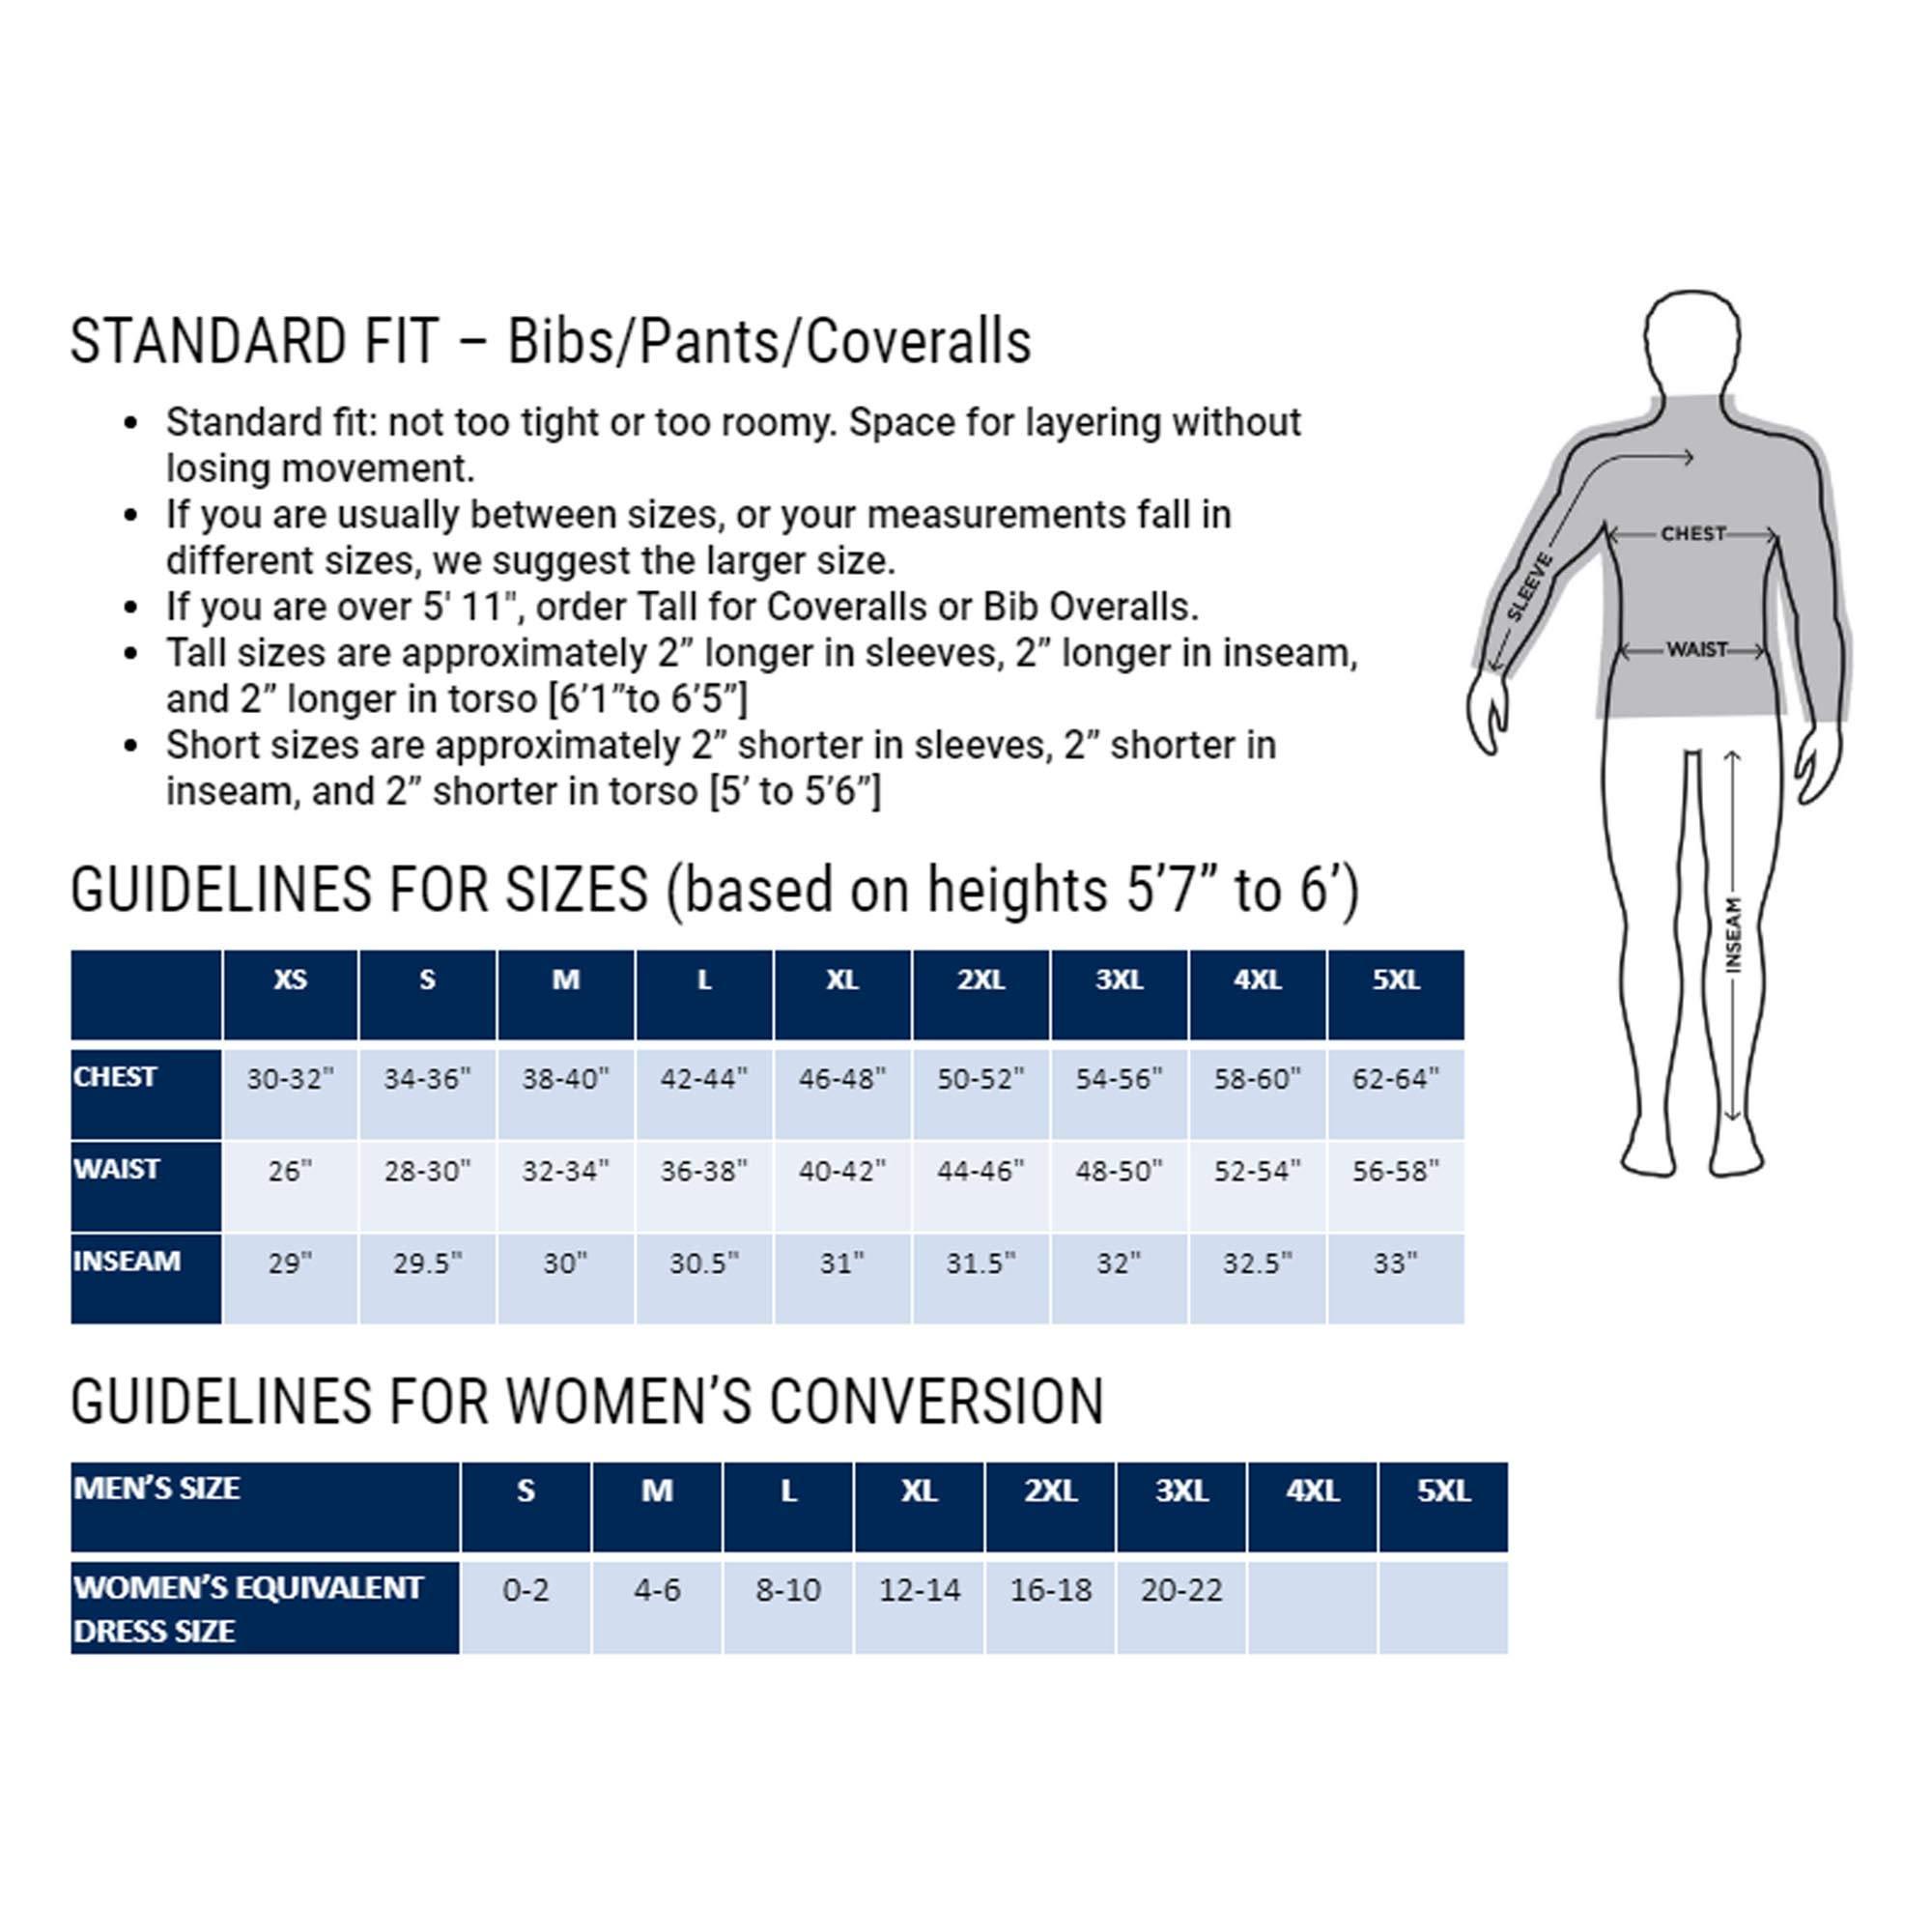 RefrigiWear Men's Water-Resistant Insulated Denim Comfortguard Coveralls (Black, XL) by RefrigiWear (Image #5)